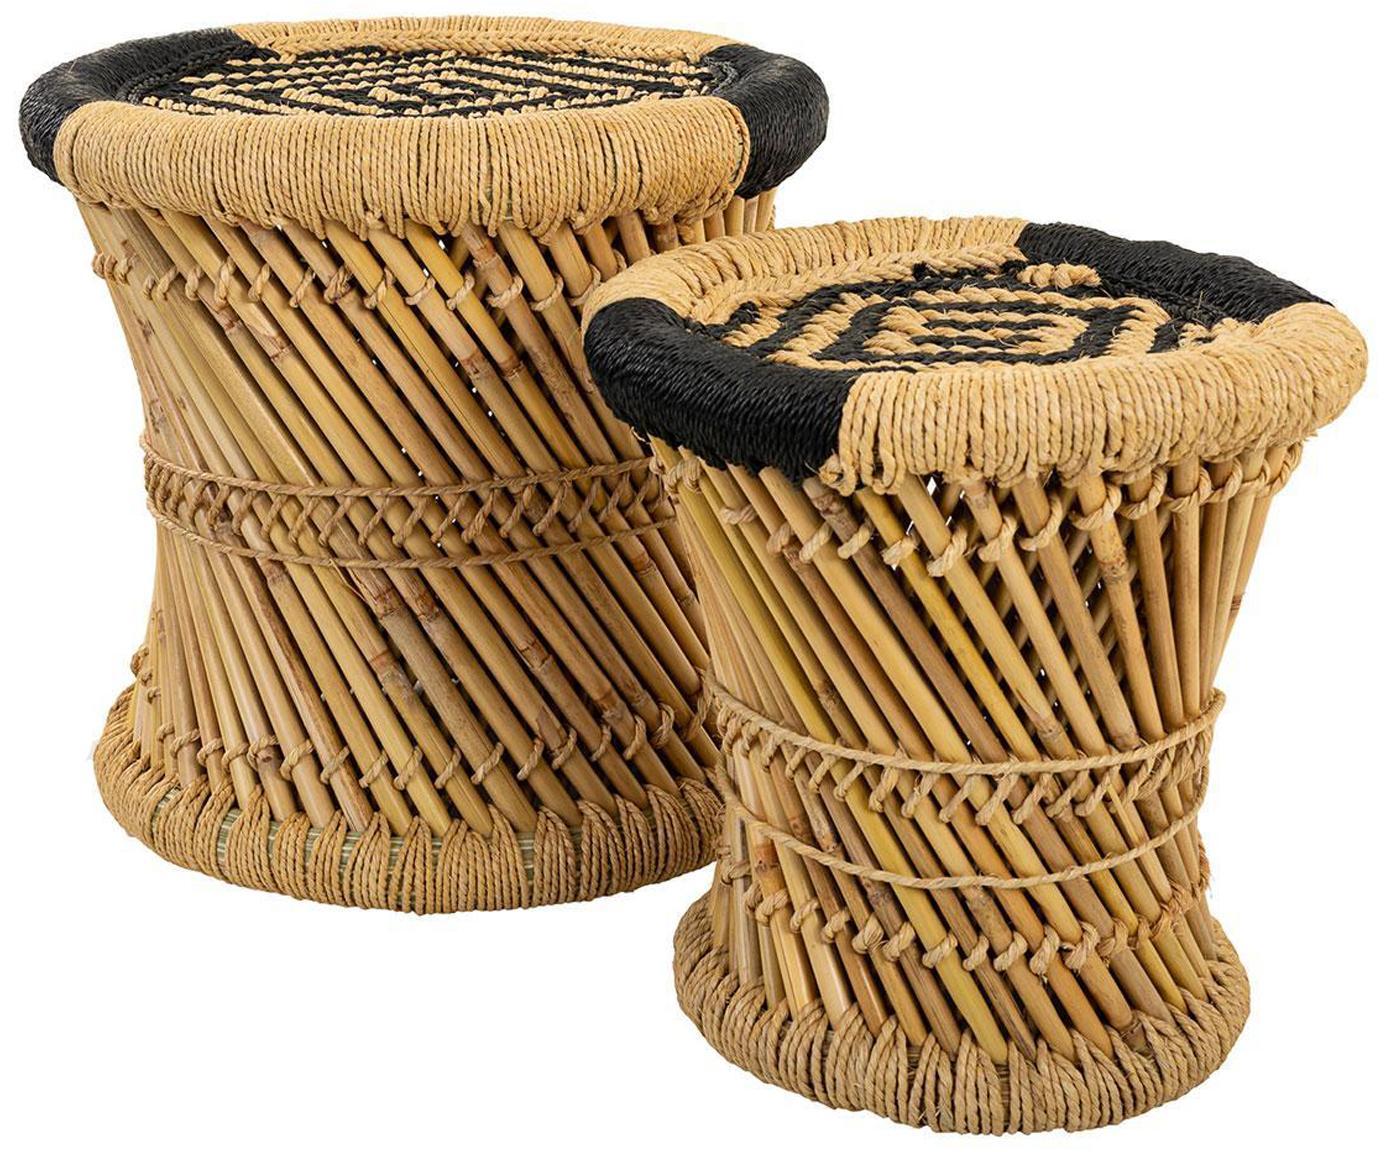 Set de taburetes de exterior Ariadna, 2pzas., Cuerda, bambú, Beige, negro, Tamaños diferentes